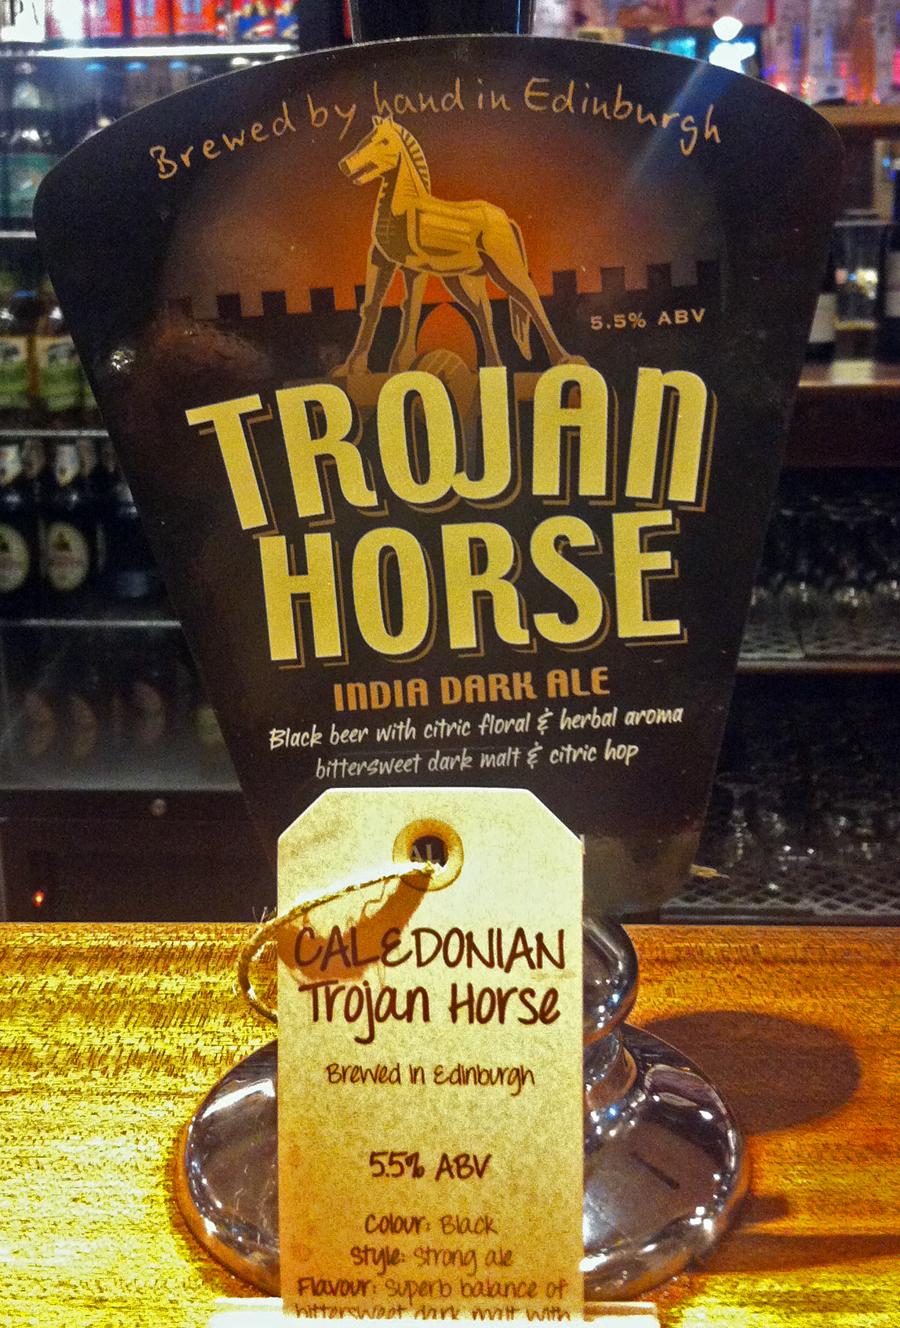 Trojan Horse IDA pump